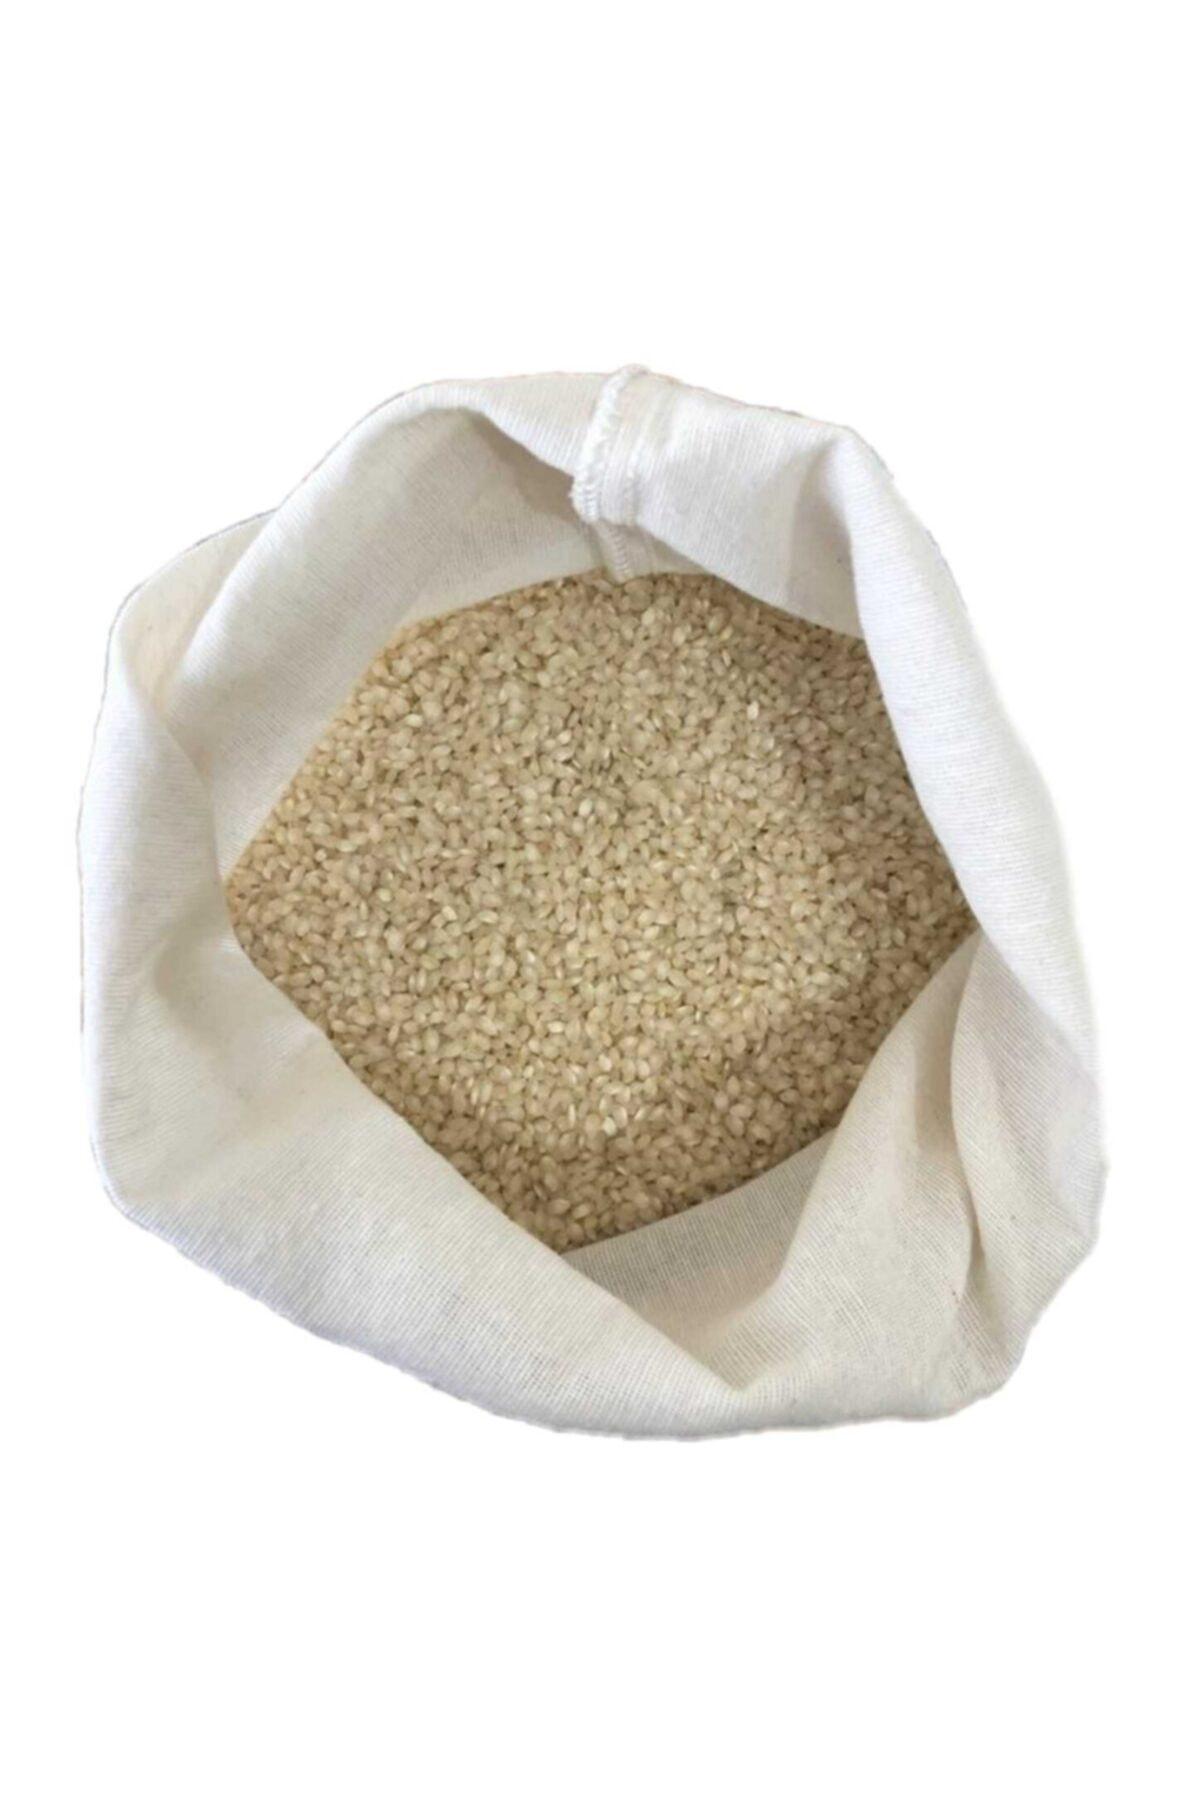 Karacadağ Pirinç (500GR)